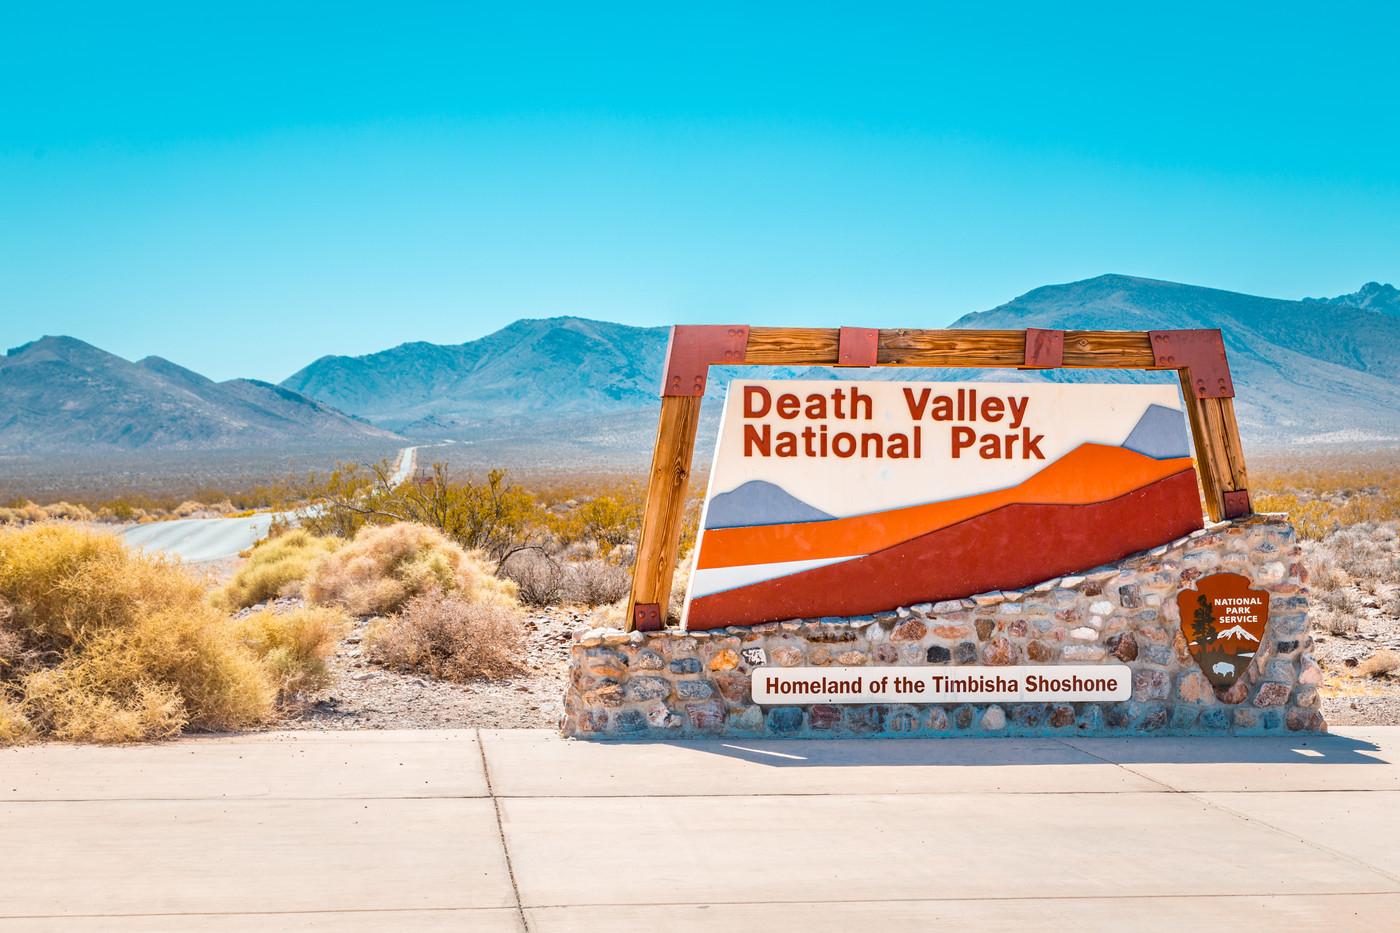 Death Valley National Park, Furnace Creek